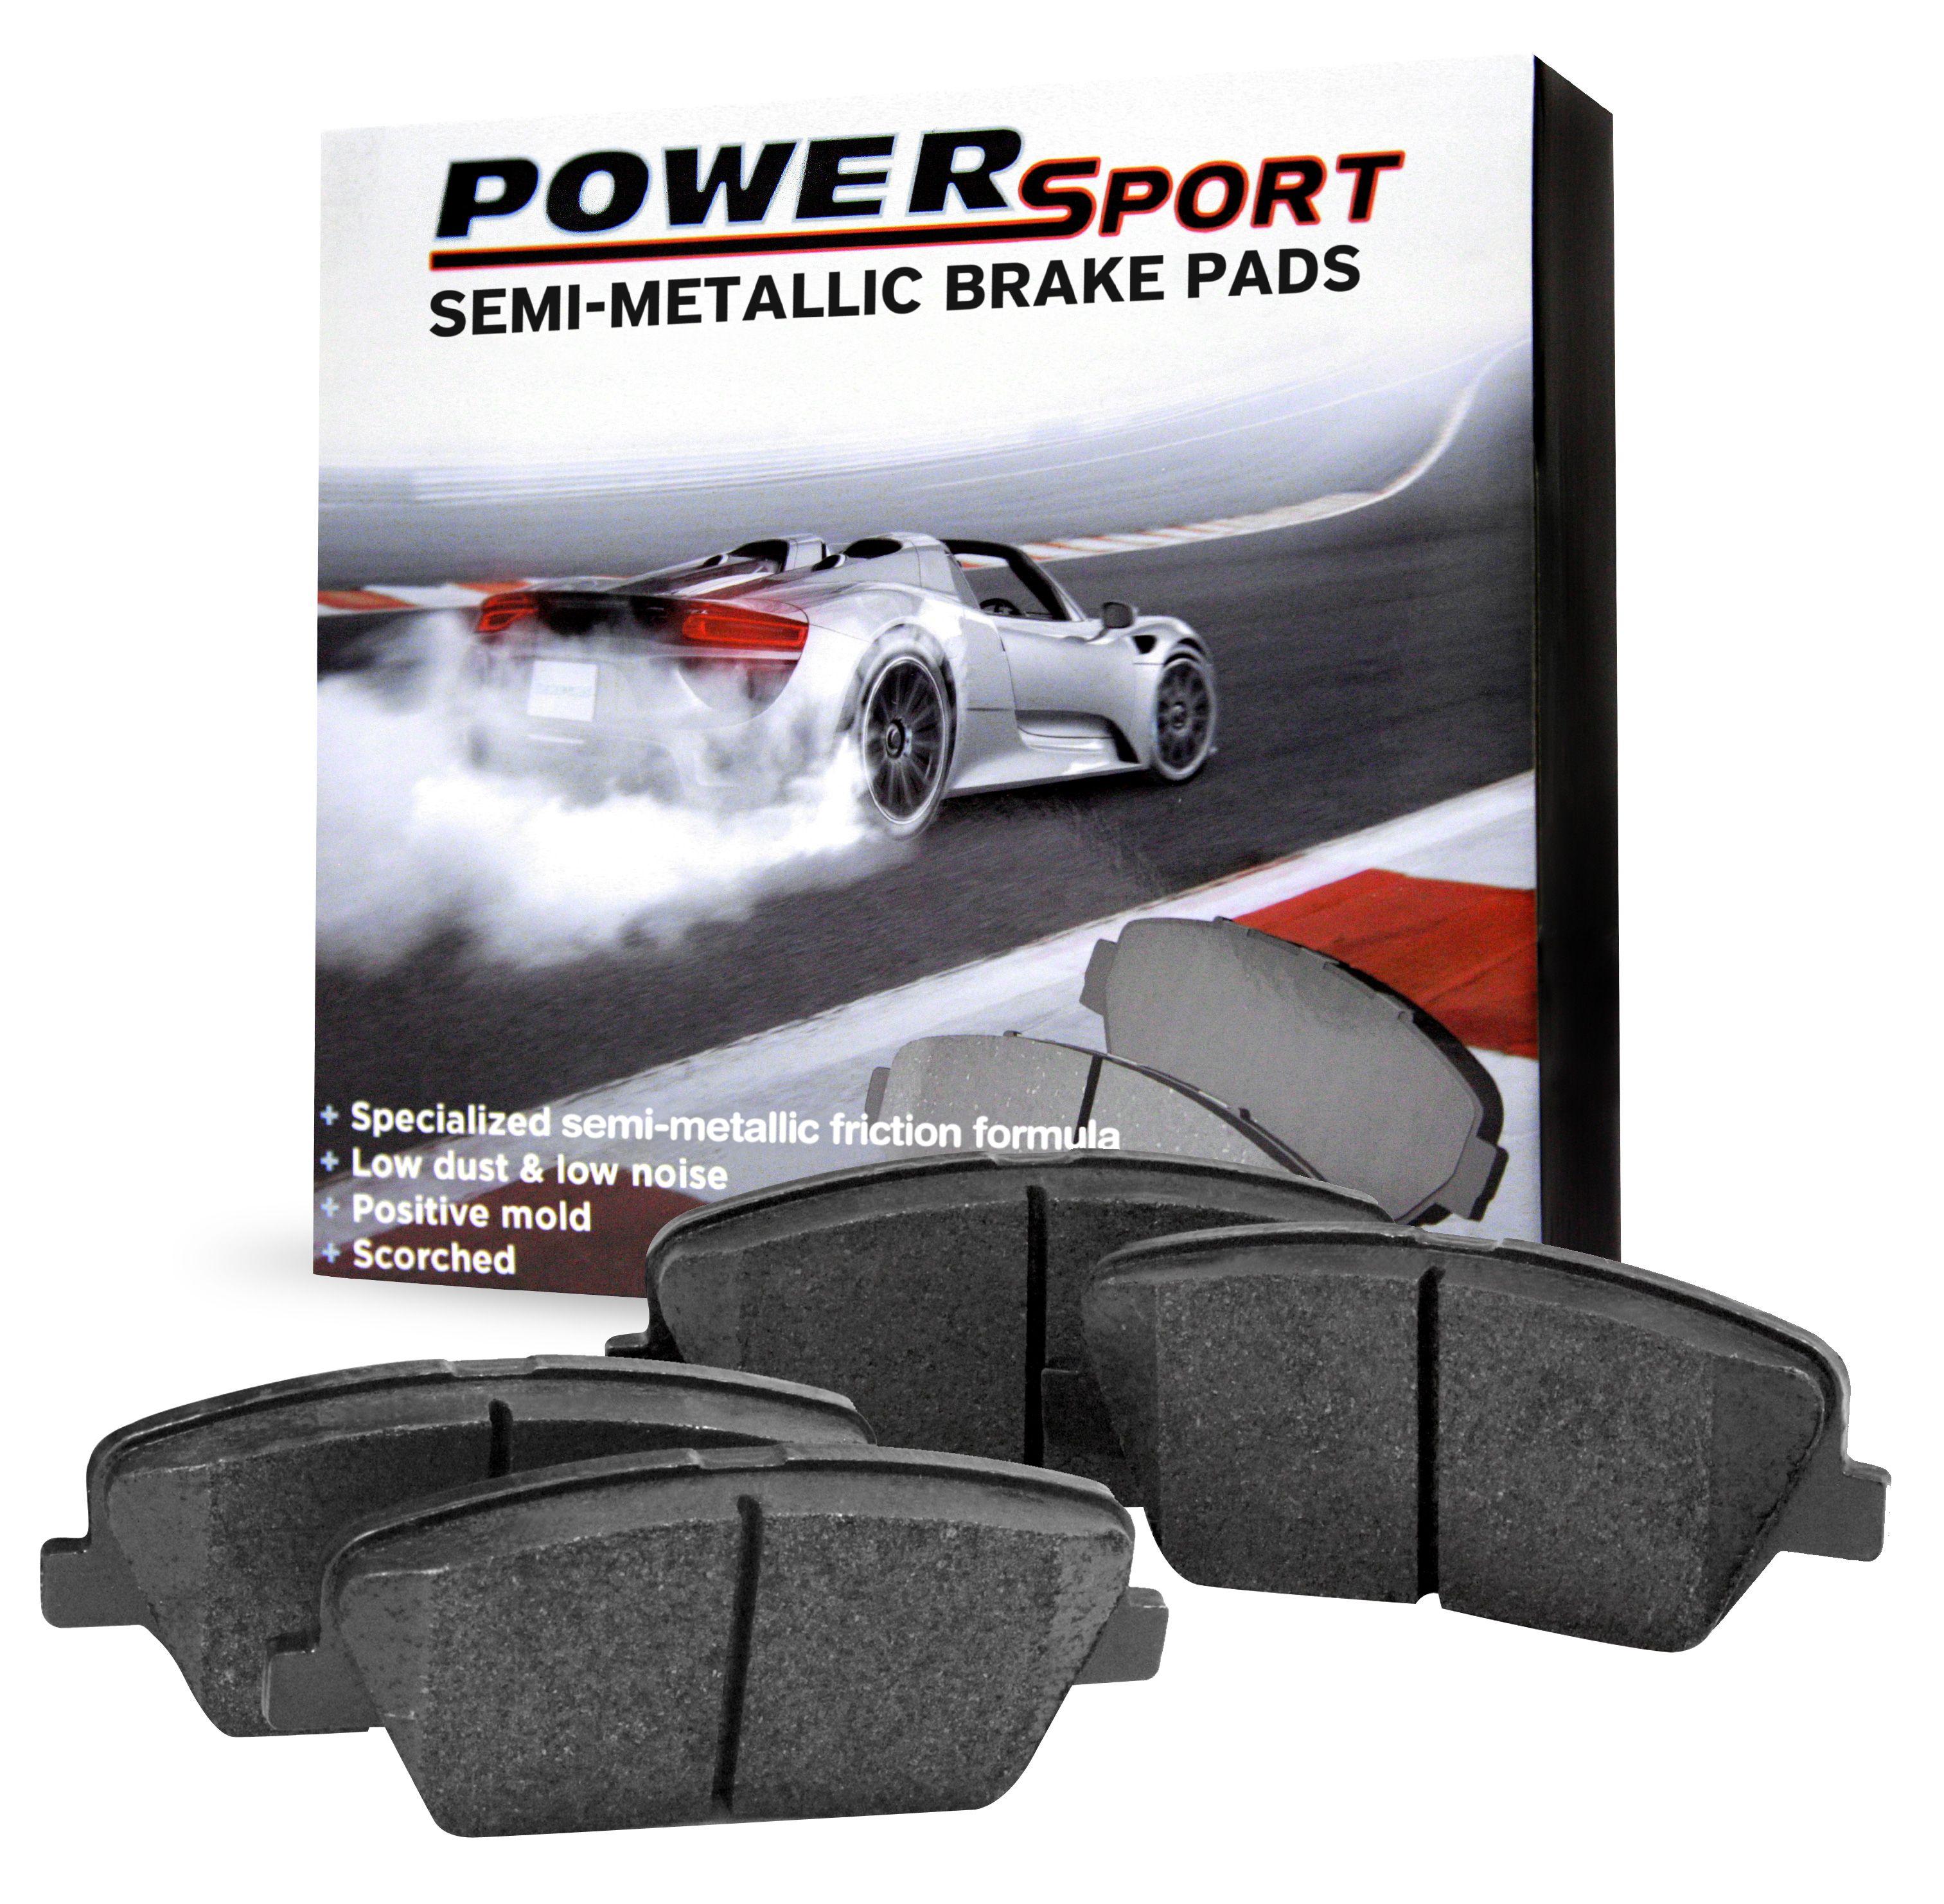 For 2005-2014 Land Rover LR3 Range Rover Sport LR4 Rear  Ceramic Brake Pads